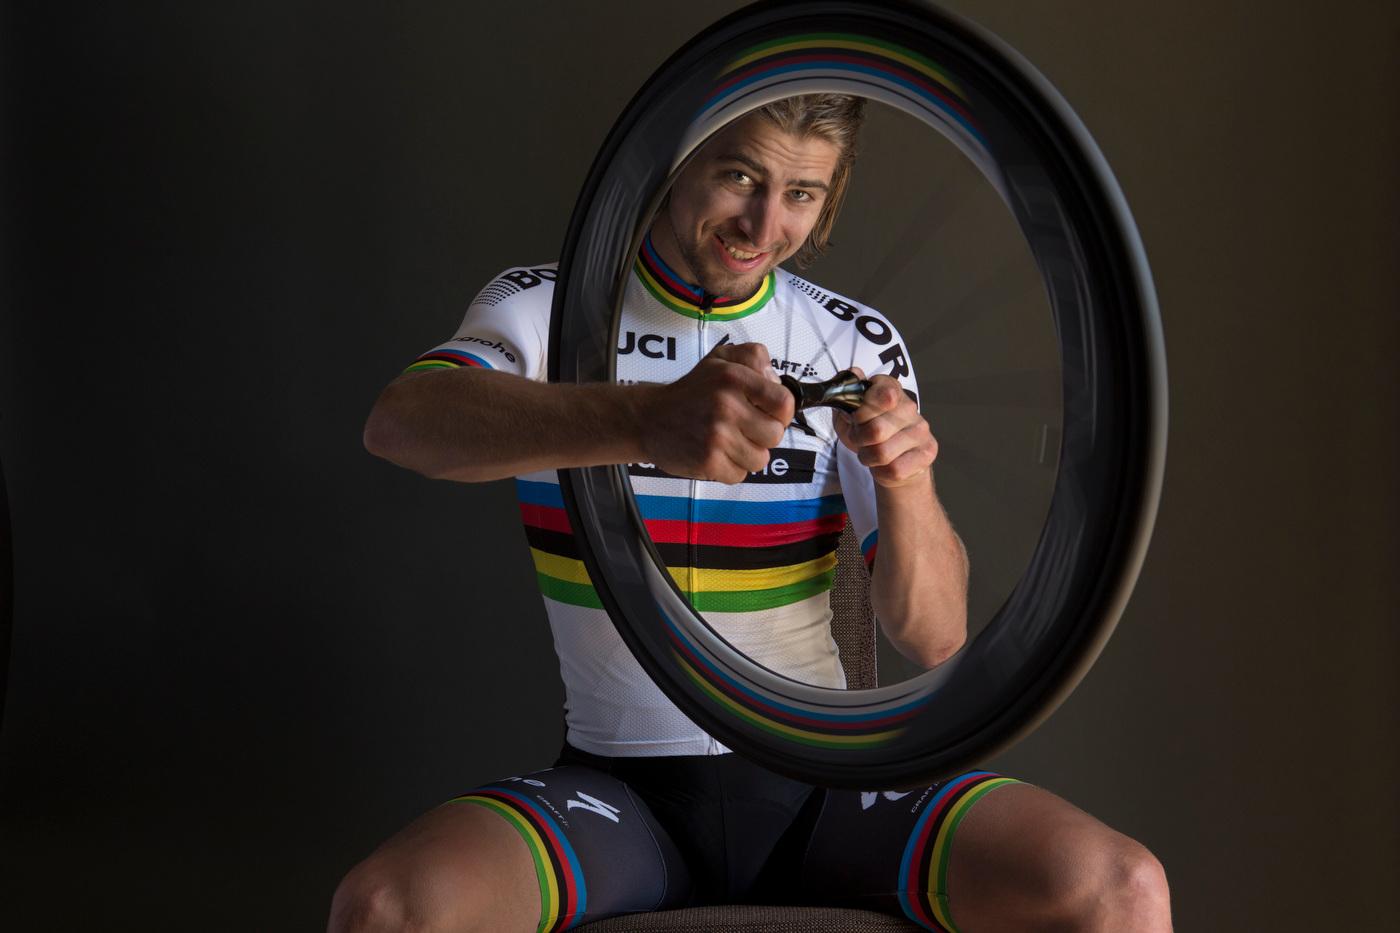 Peter Sagan, road cycling world champion, for VSD Magazine.